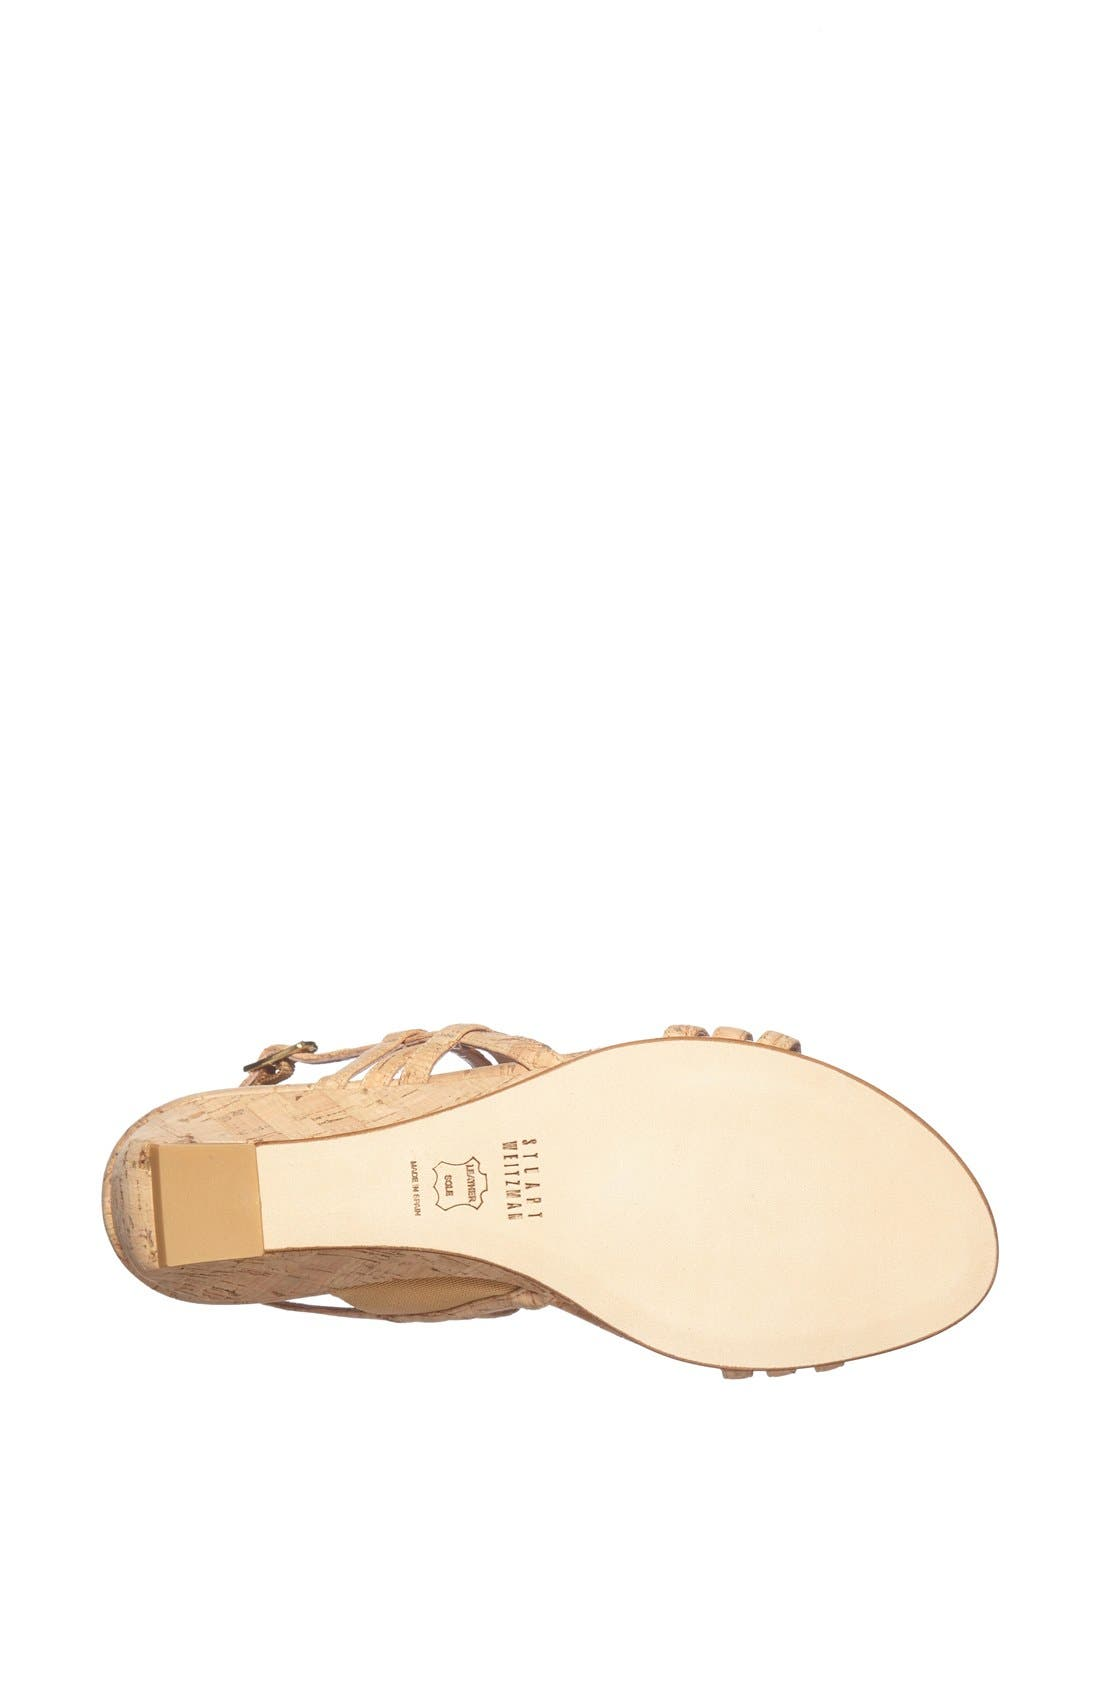 Alternate Image 3  - Stuart Weitzman 'Playful' Metallic Leather Sandal